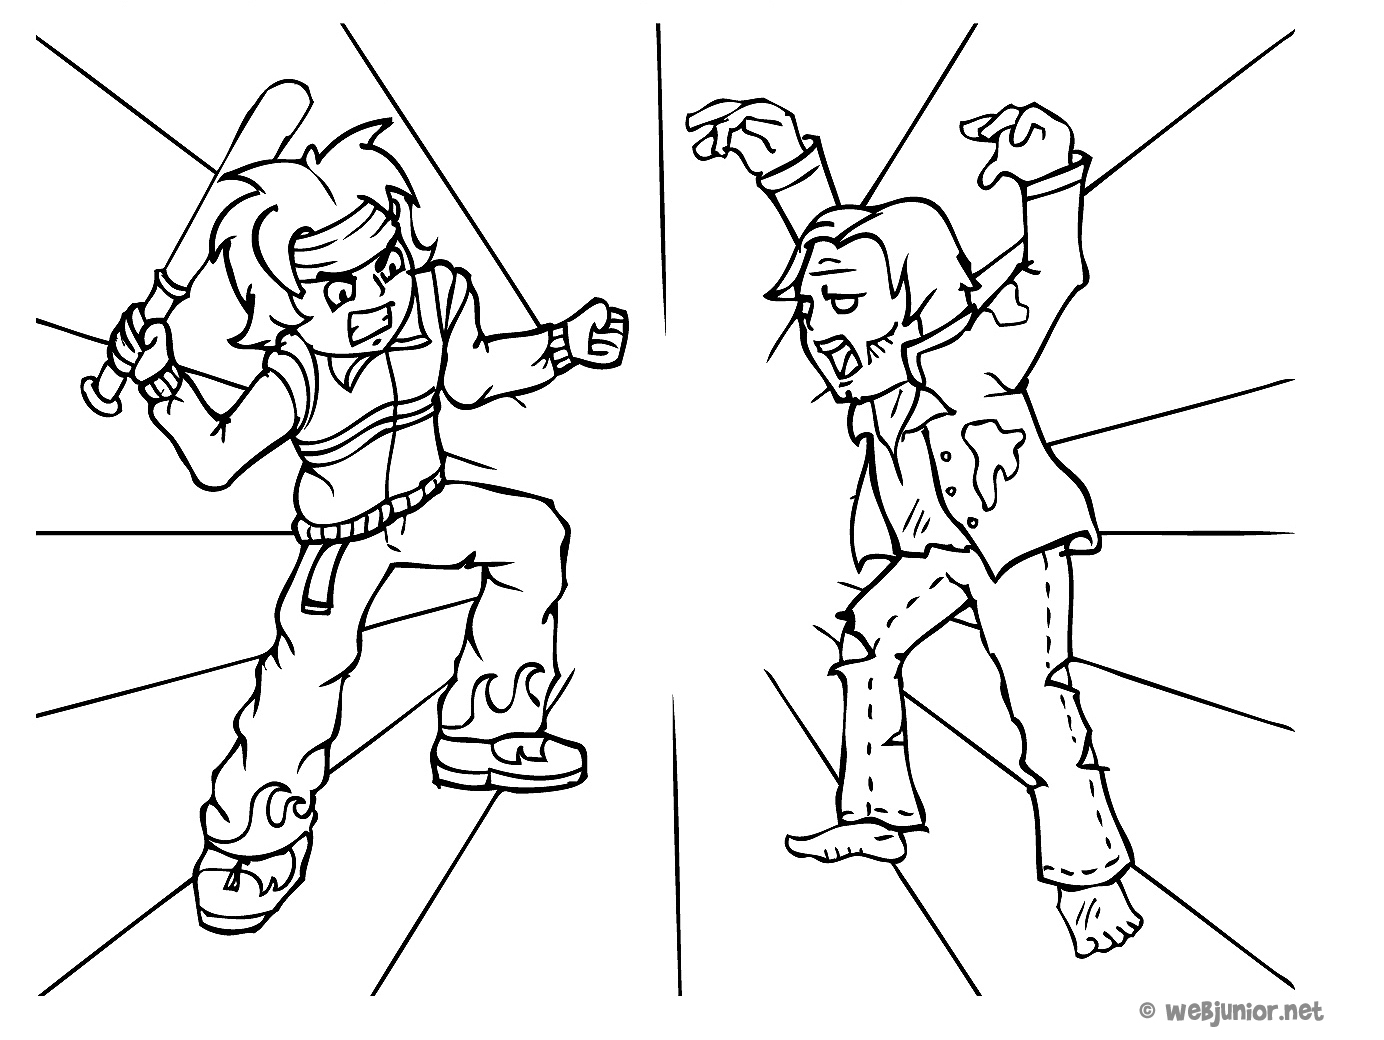 dessin de combat de catch